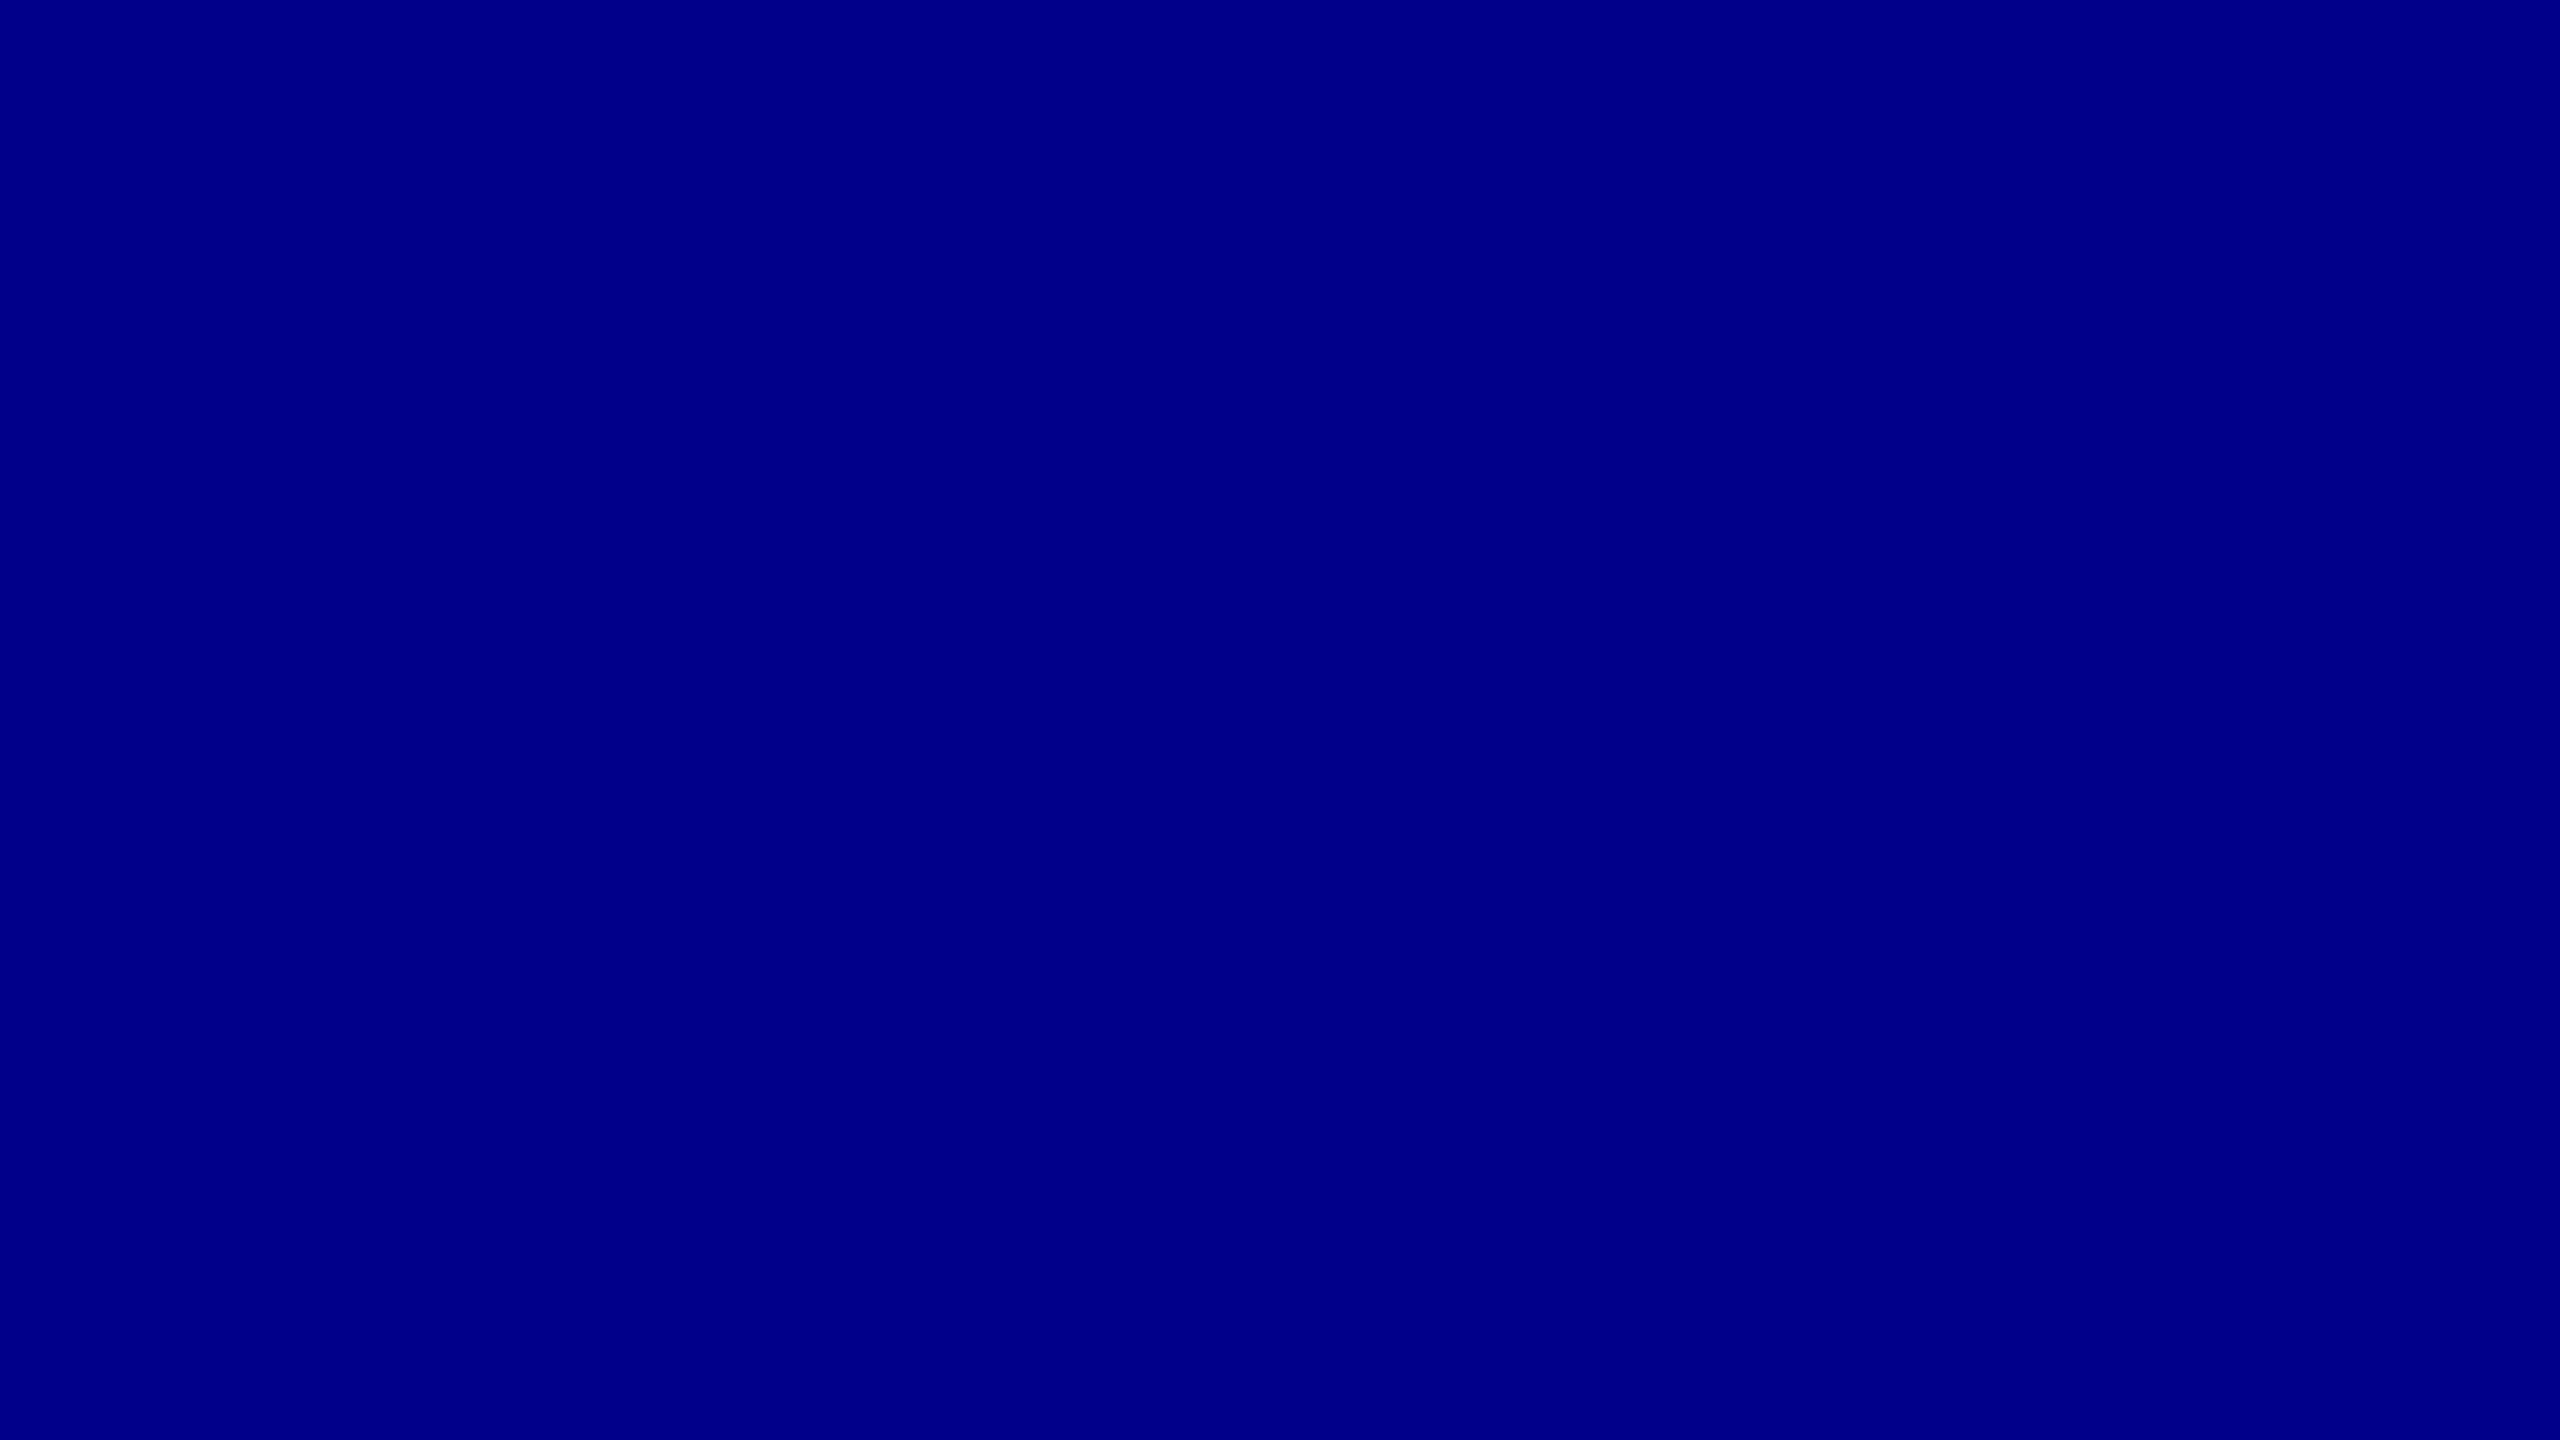 111127-download-free-royal-blue-backgrou